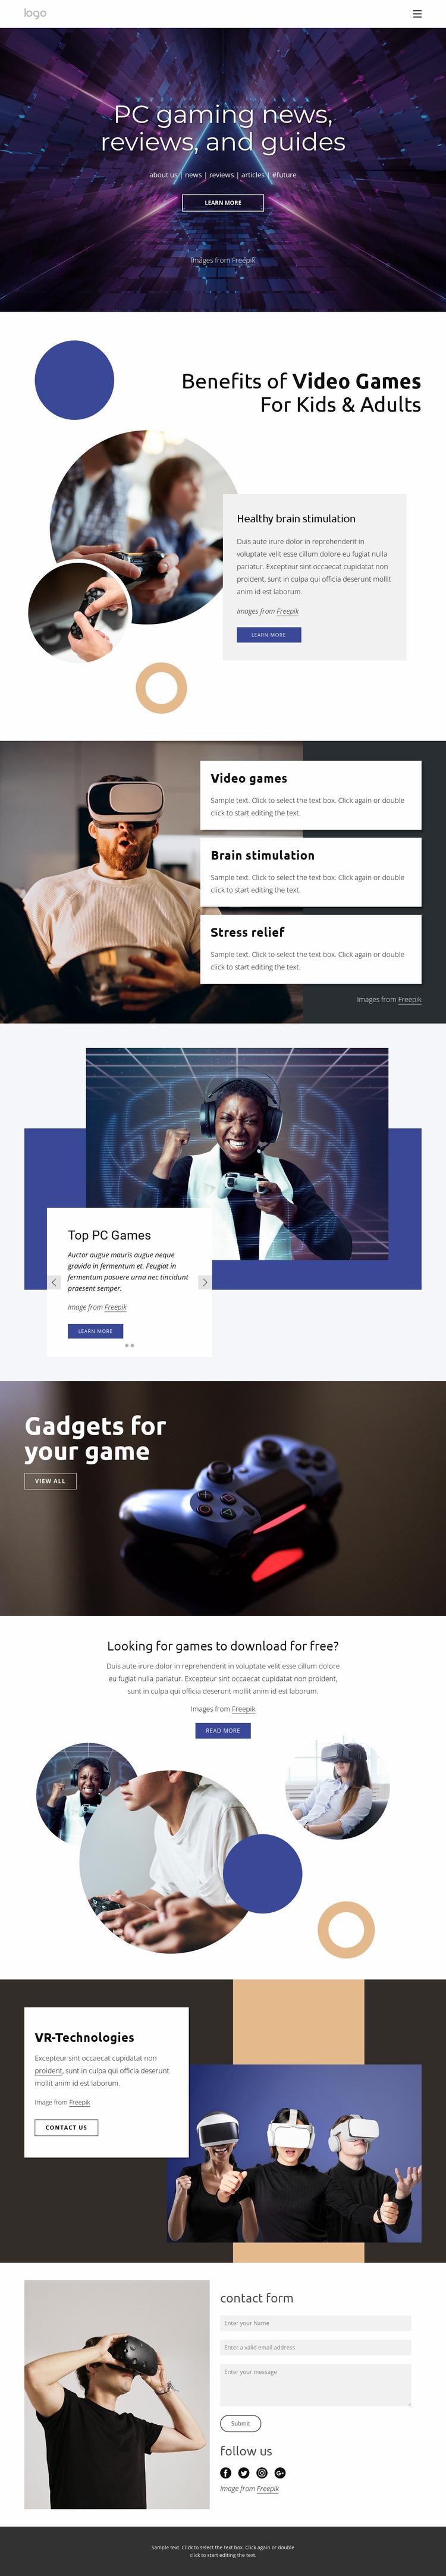 PC gaming news Website Mockup